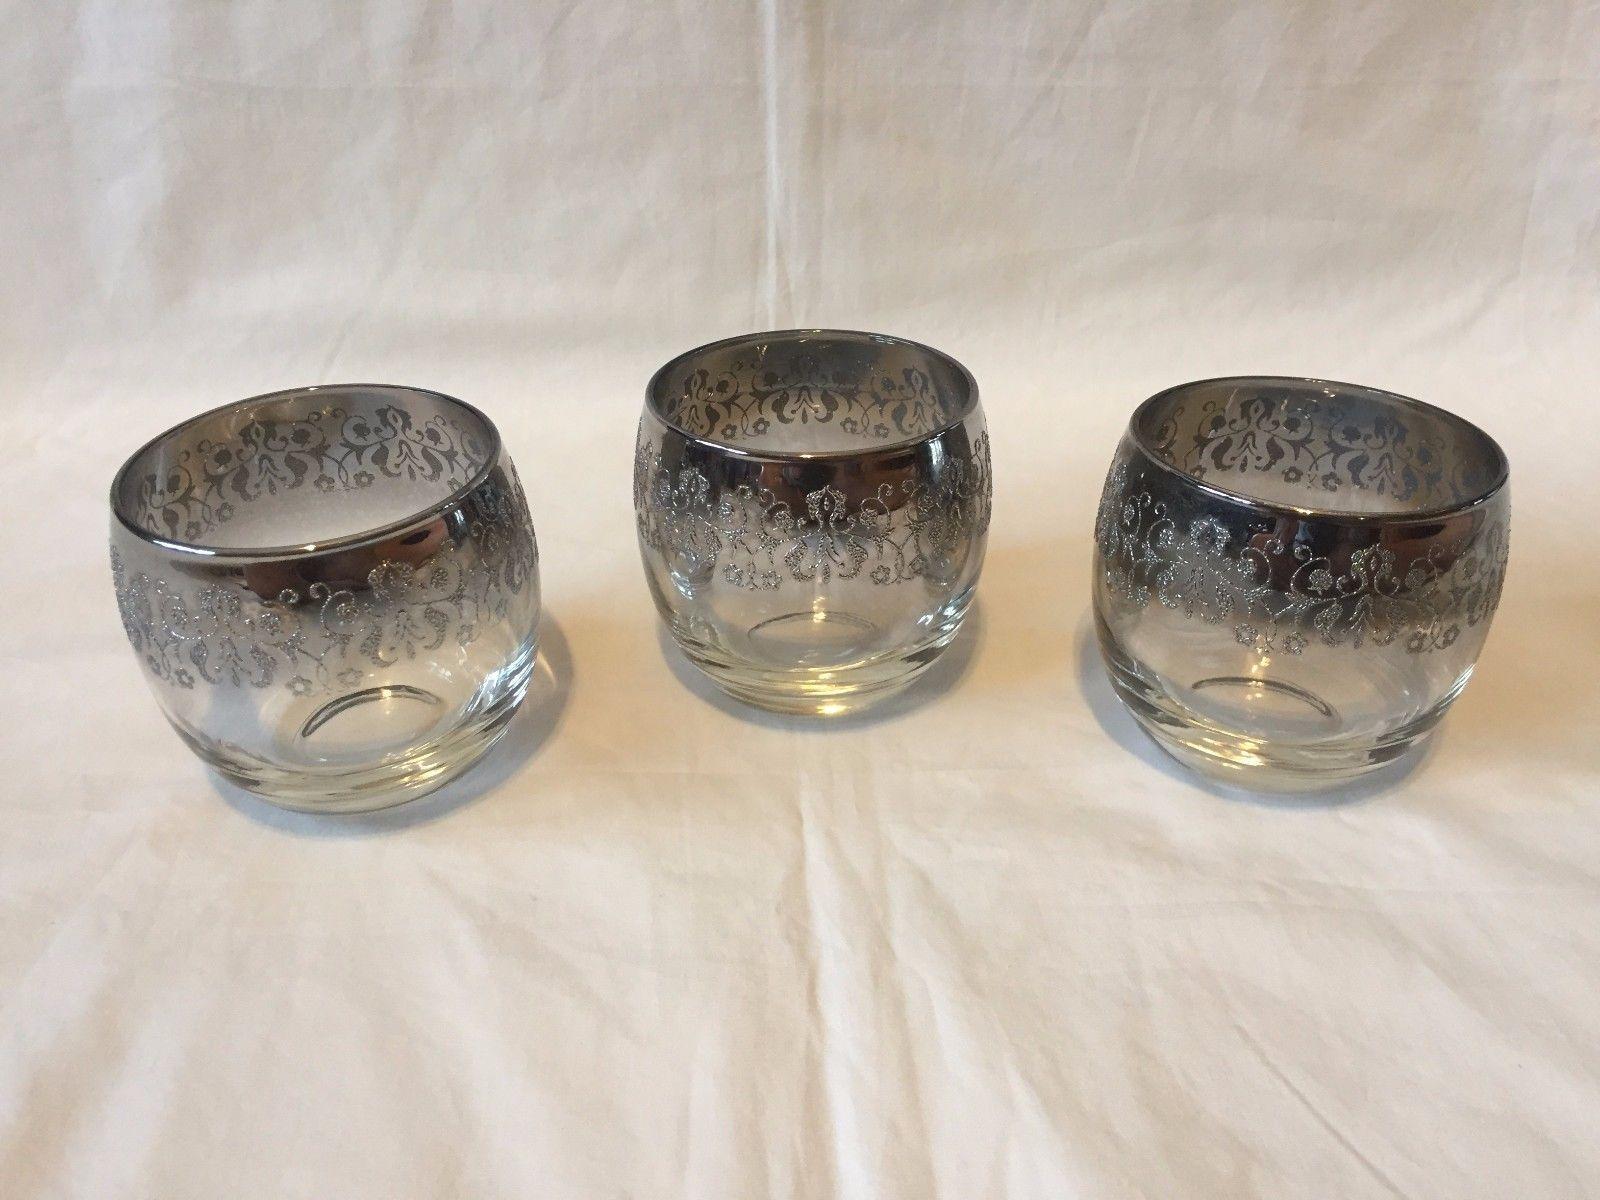 Vtg 70's Silver Rimmed Sparkly Design Drinking Glasses